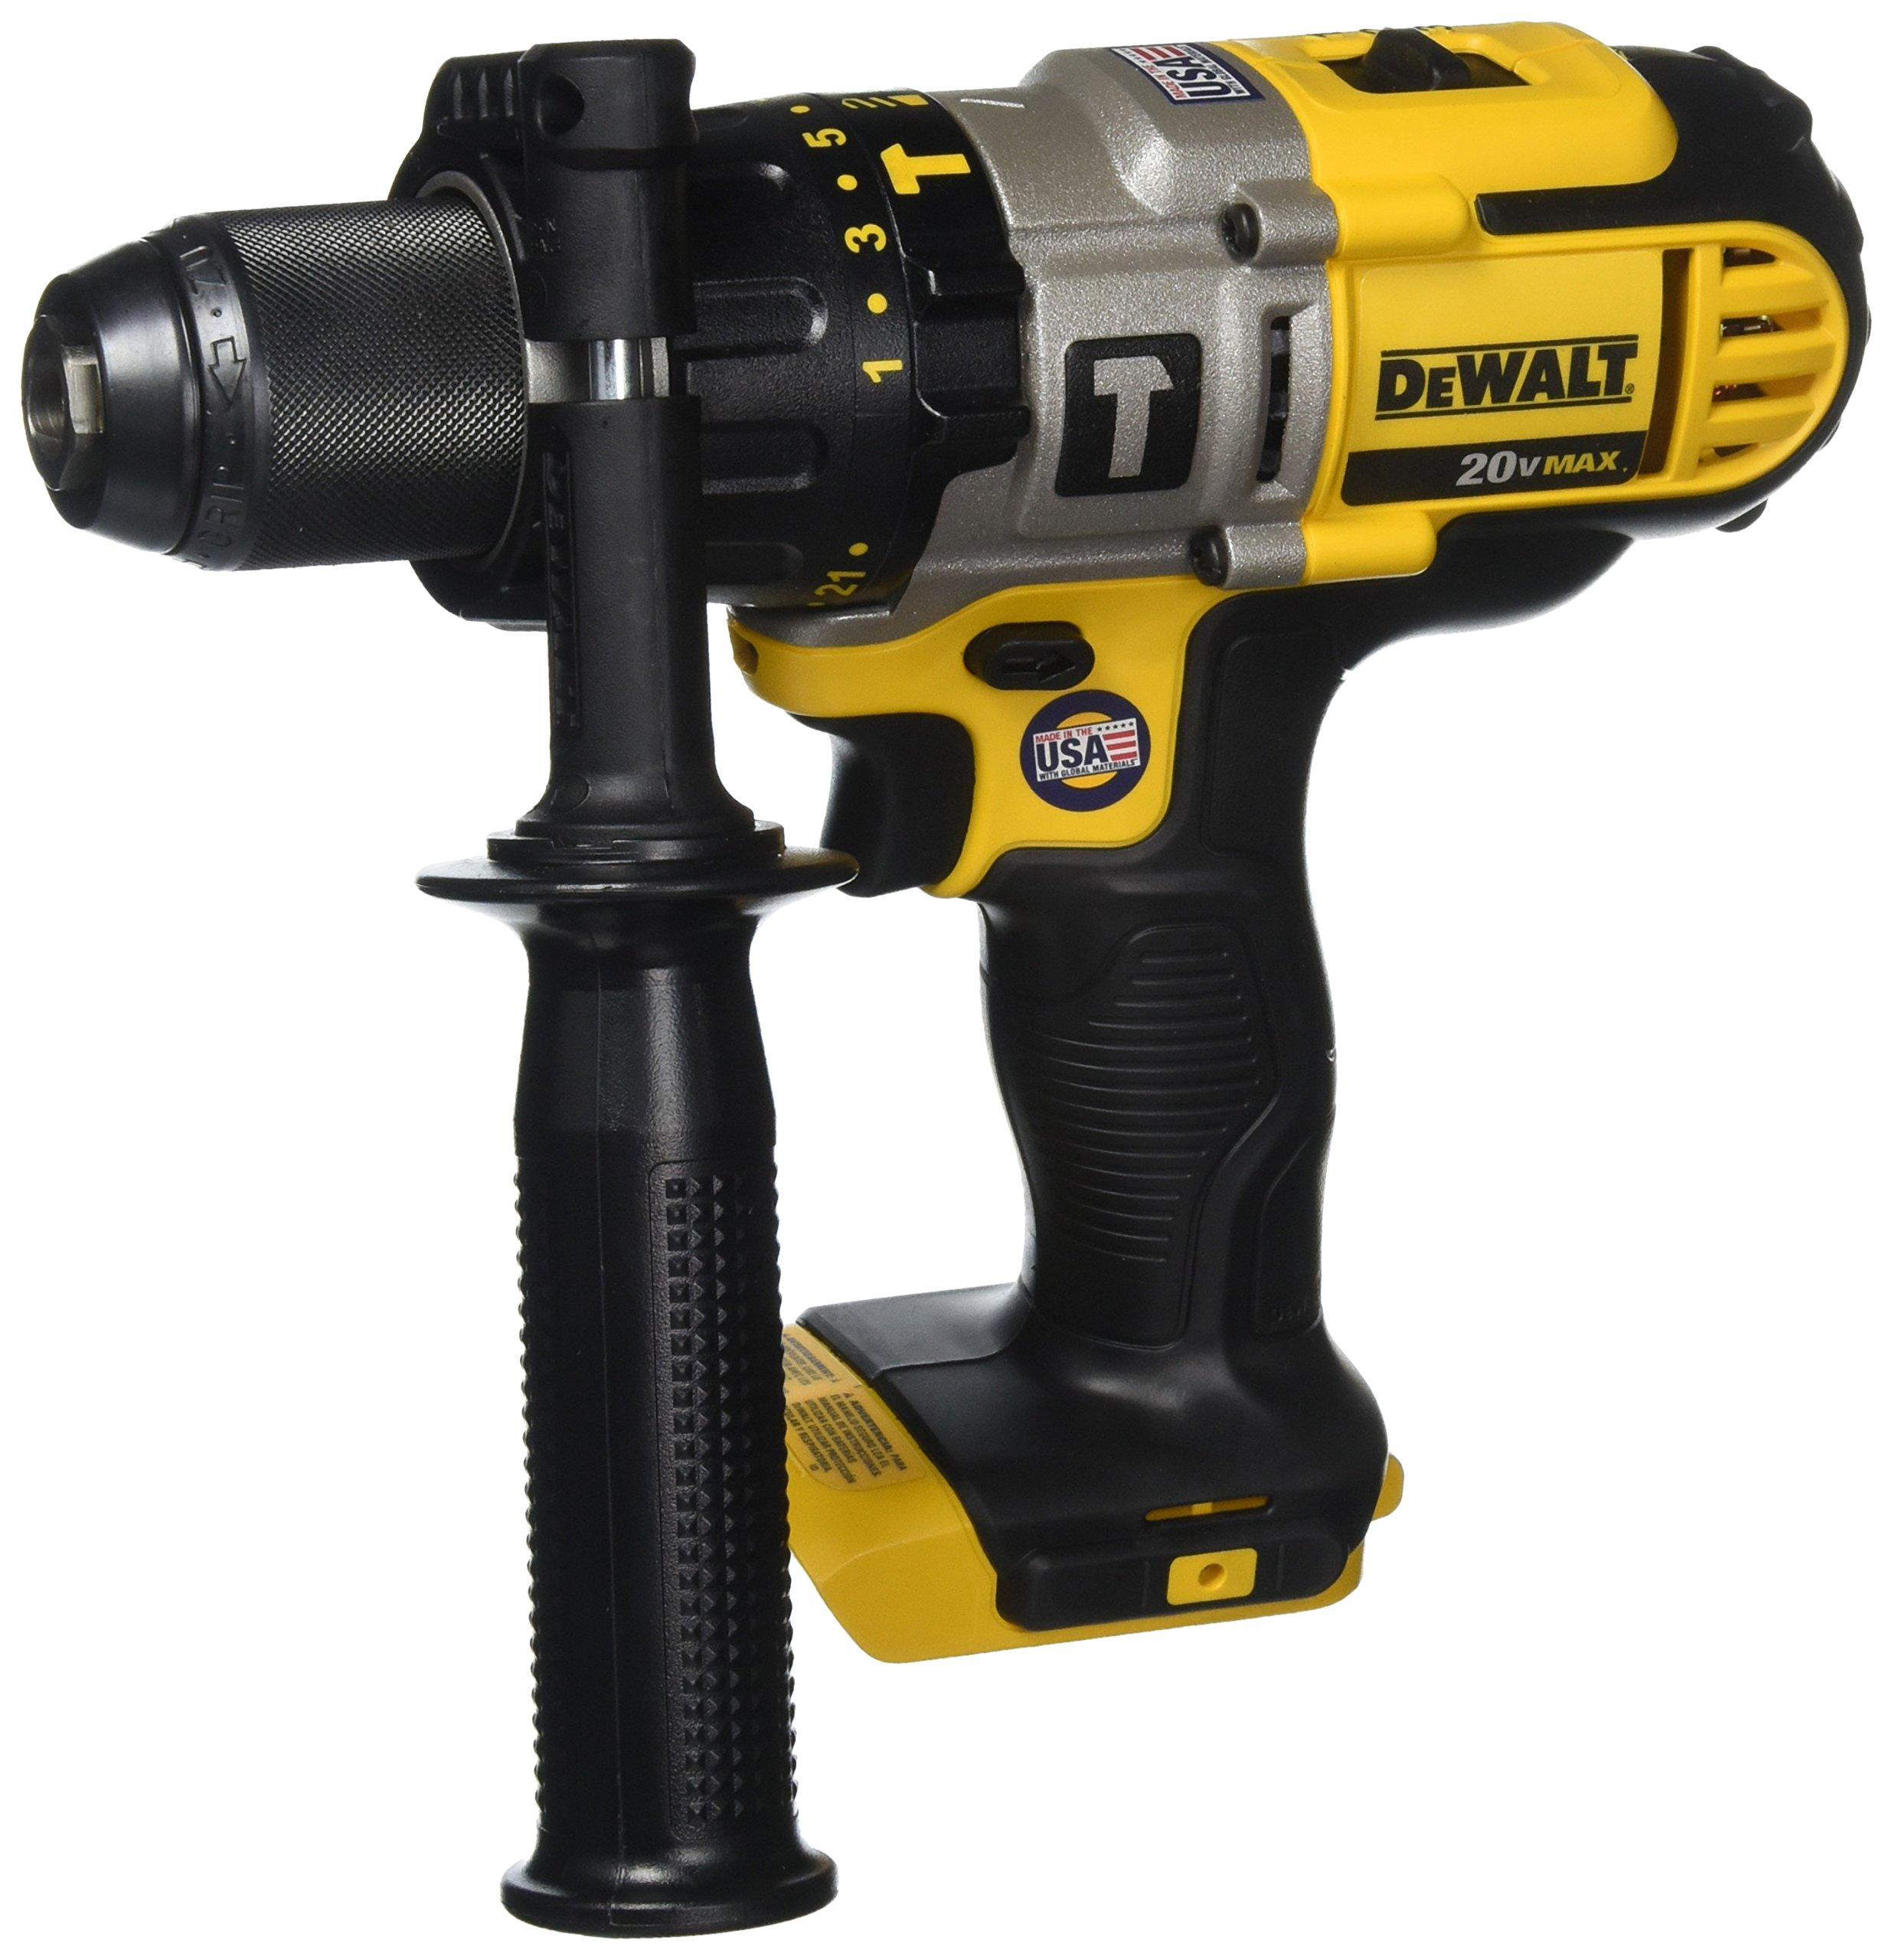 DEWALT DCD985B 20-Volt MAX Lithium Ion 1/2-Inch Hammer Drill/Drill Driver by DEWALT